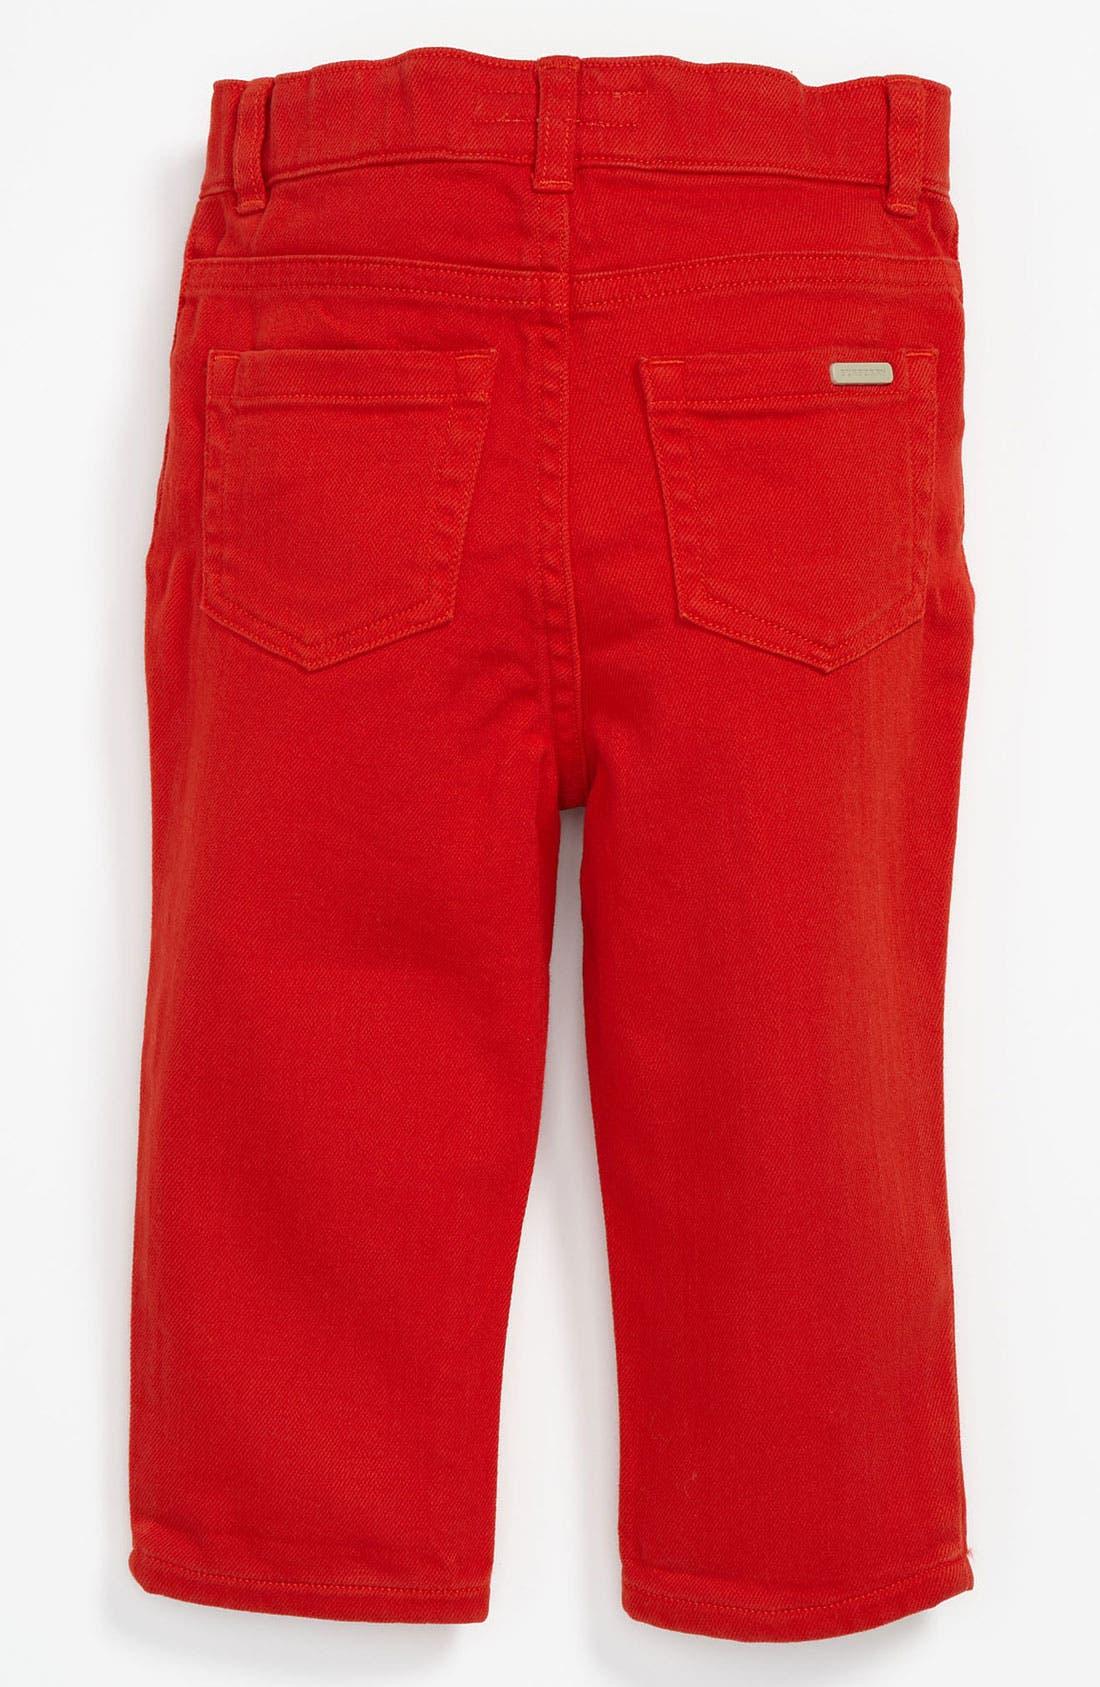 Alternate Image 1 Selected - Burberry 'Langston' Skinny Leg Jeans (Toddler)